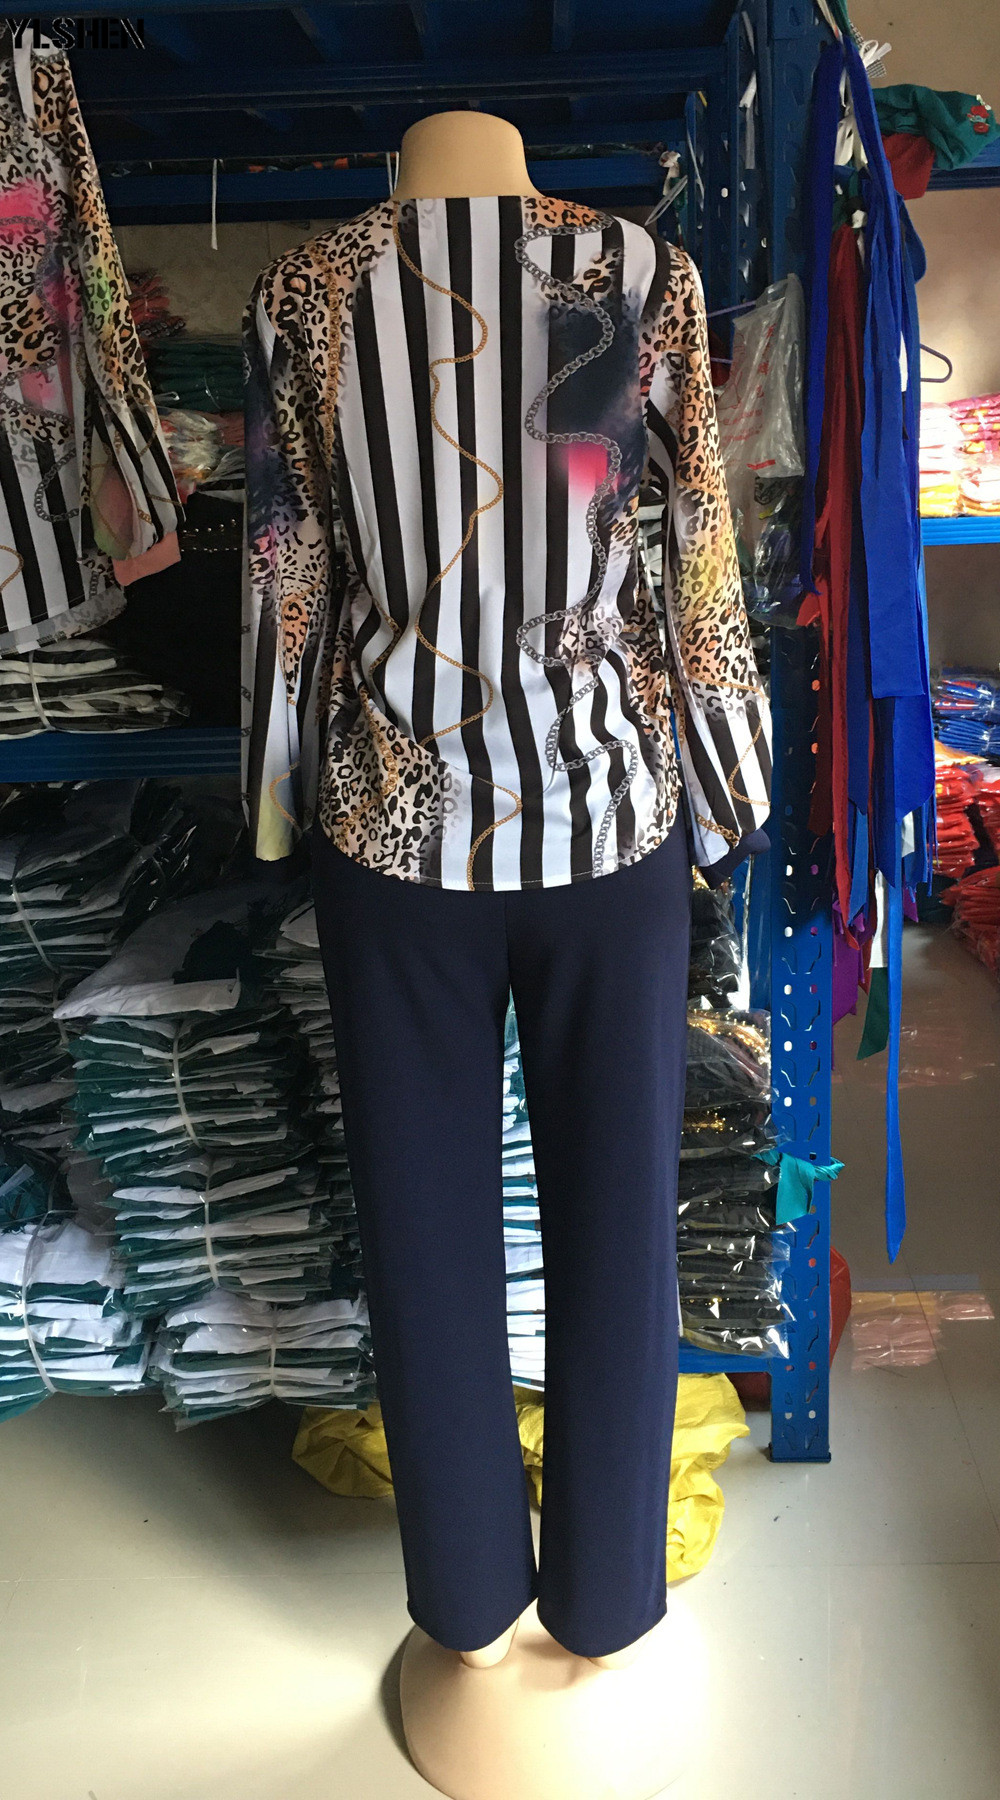 Two 2 Piece Set African Clothes Africa 2020 Dashiki Fashion Print Dresses Suit Bazin Top Pants Elastic Party Plus Size Clothing 15